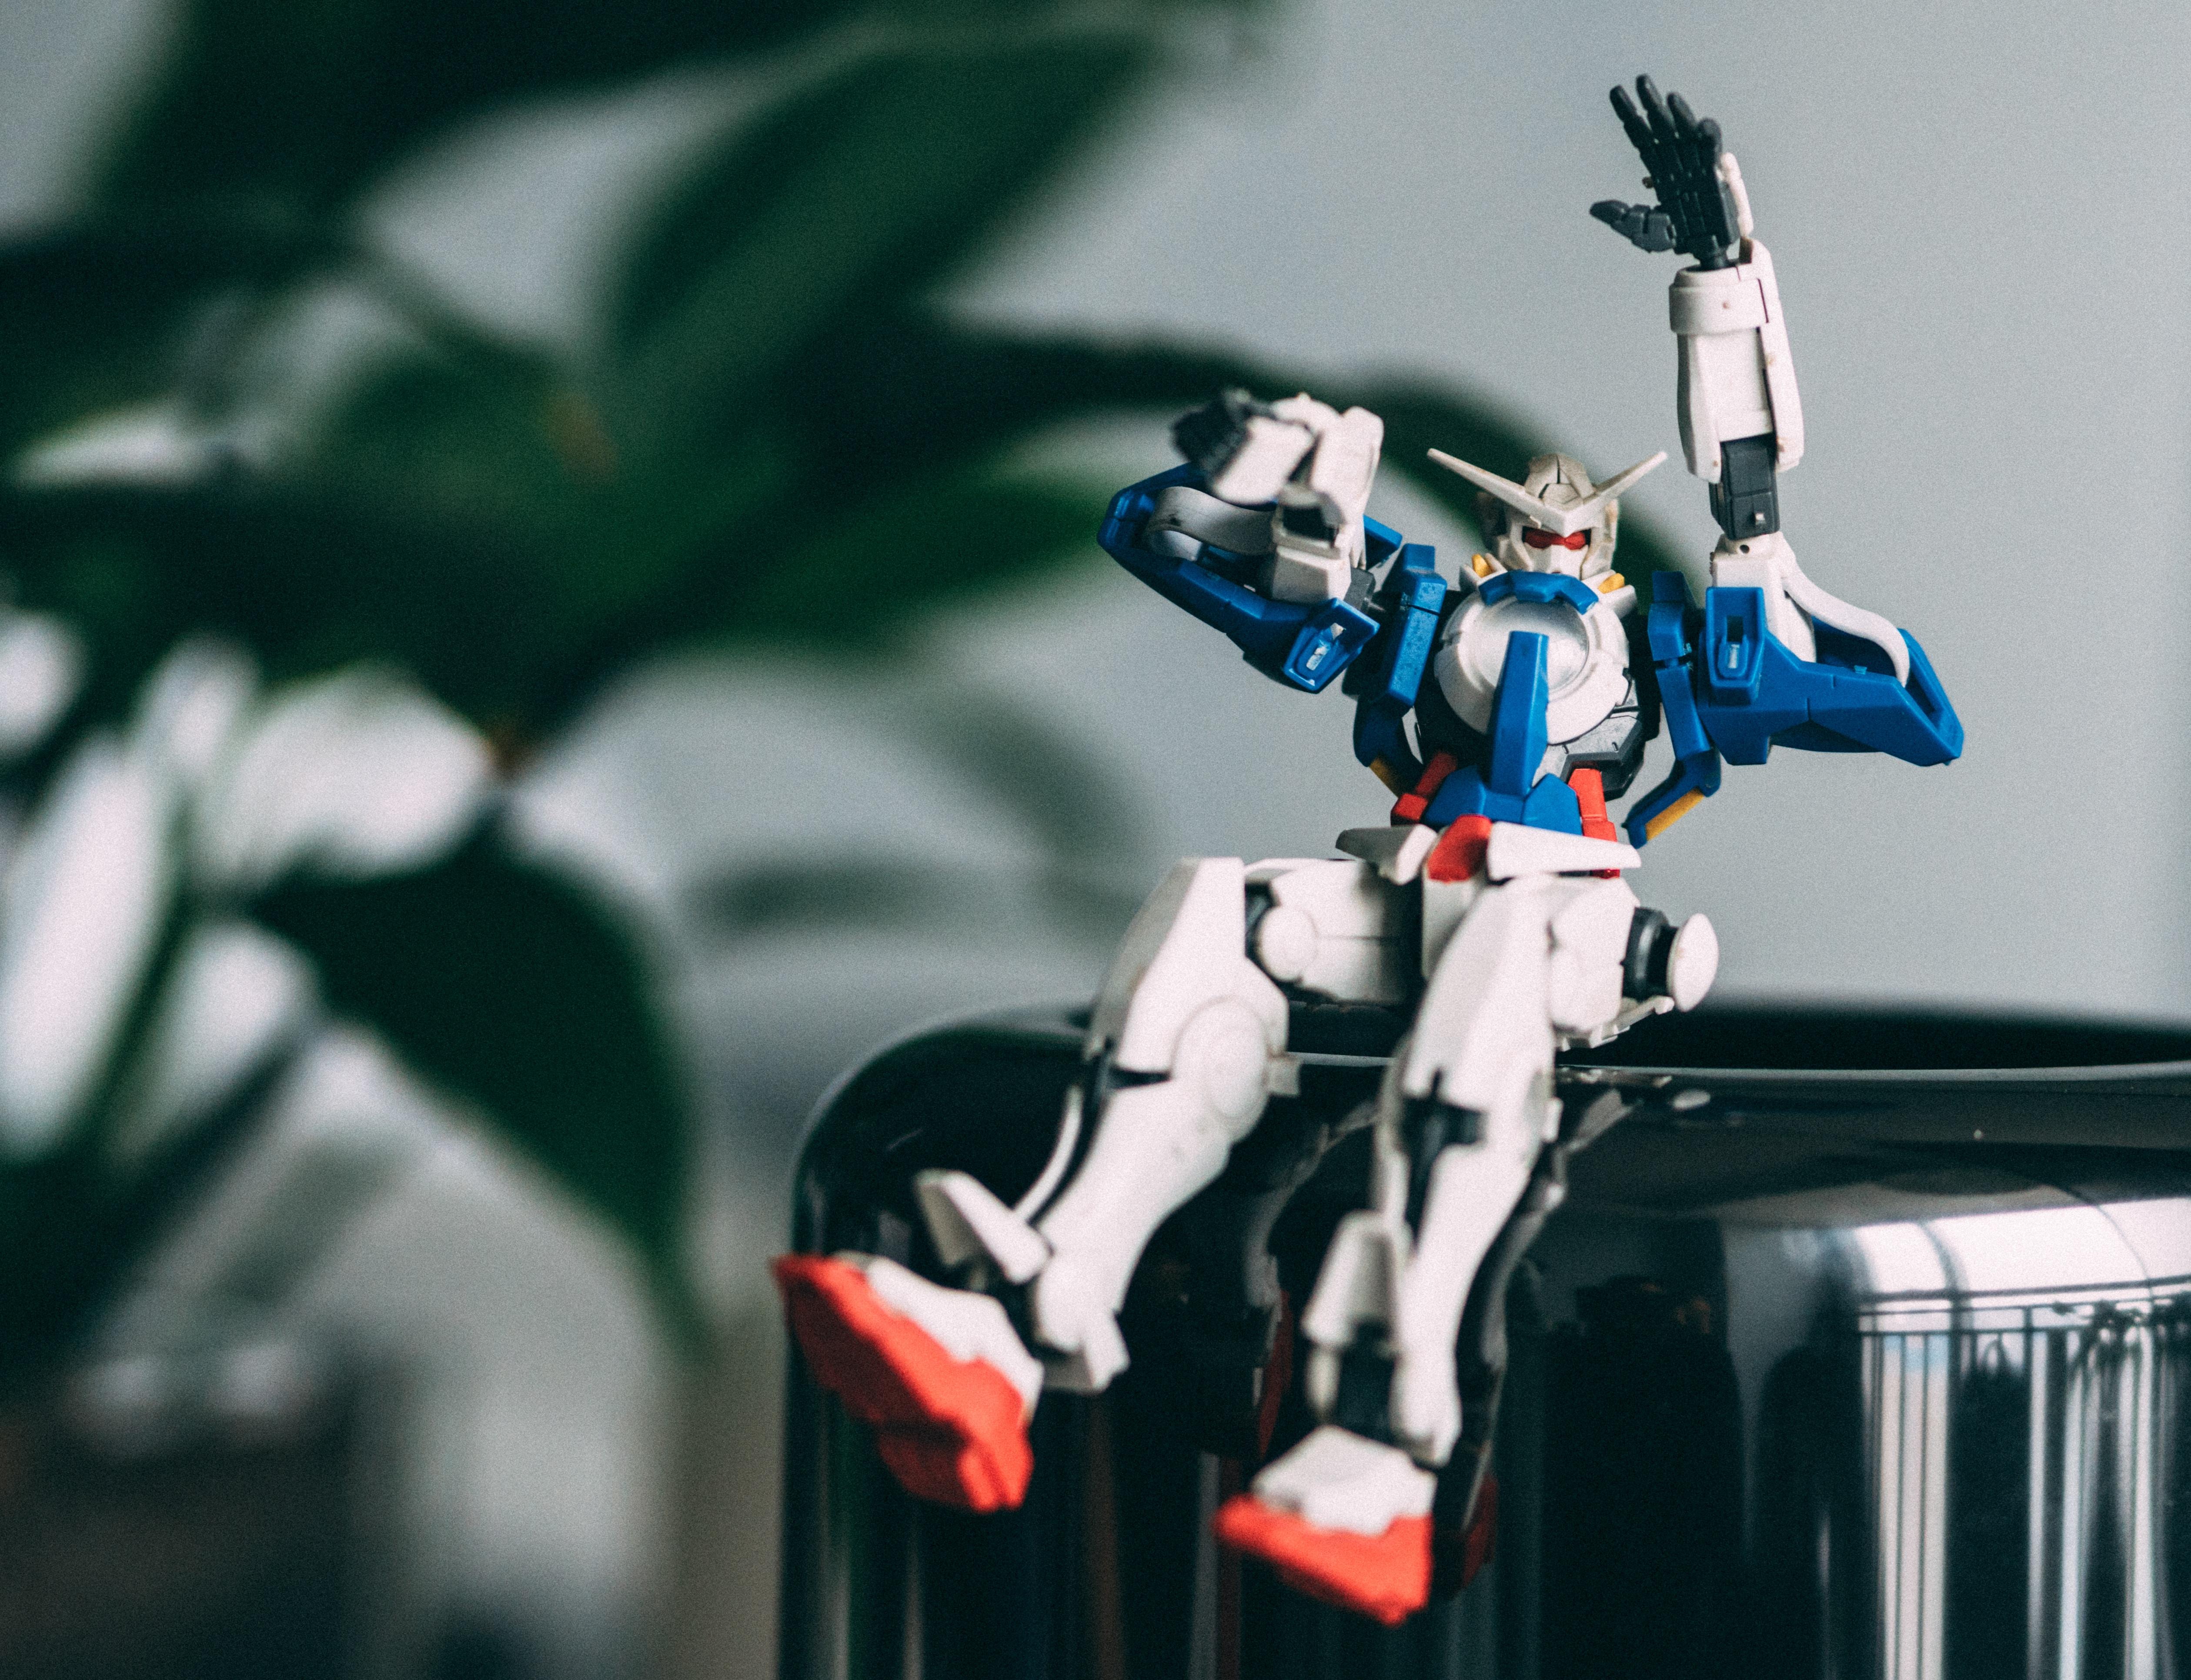 Gundam action figure on